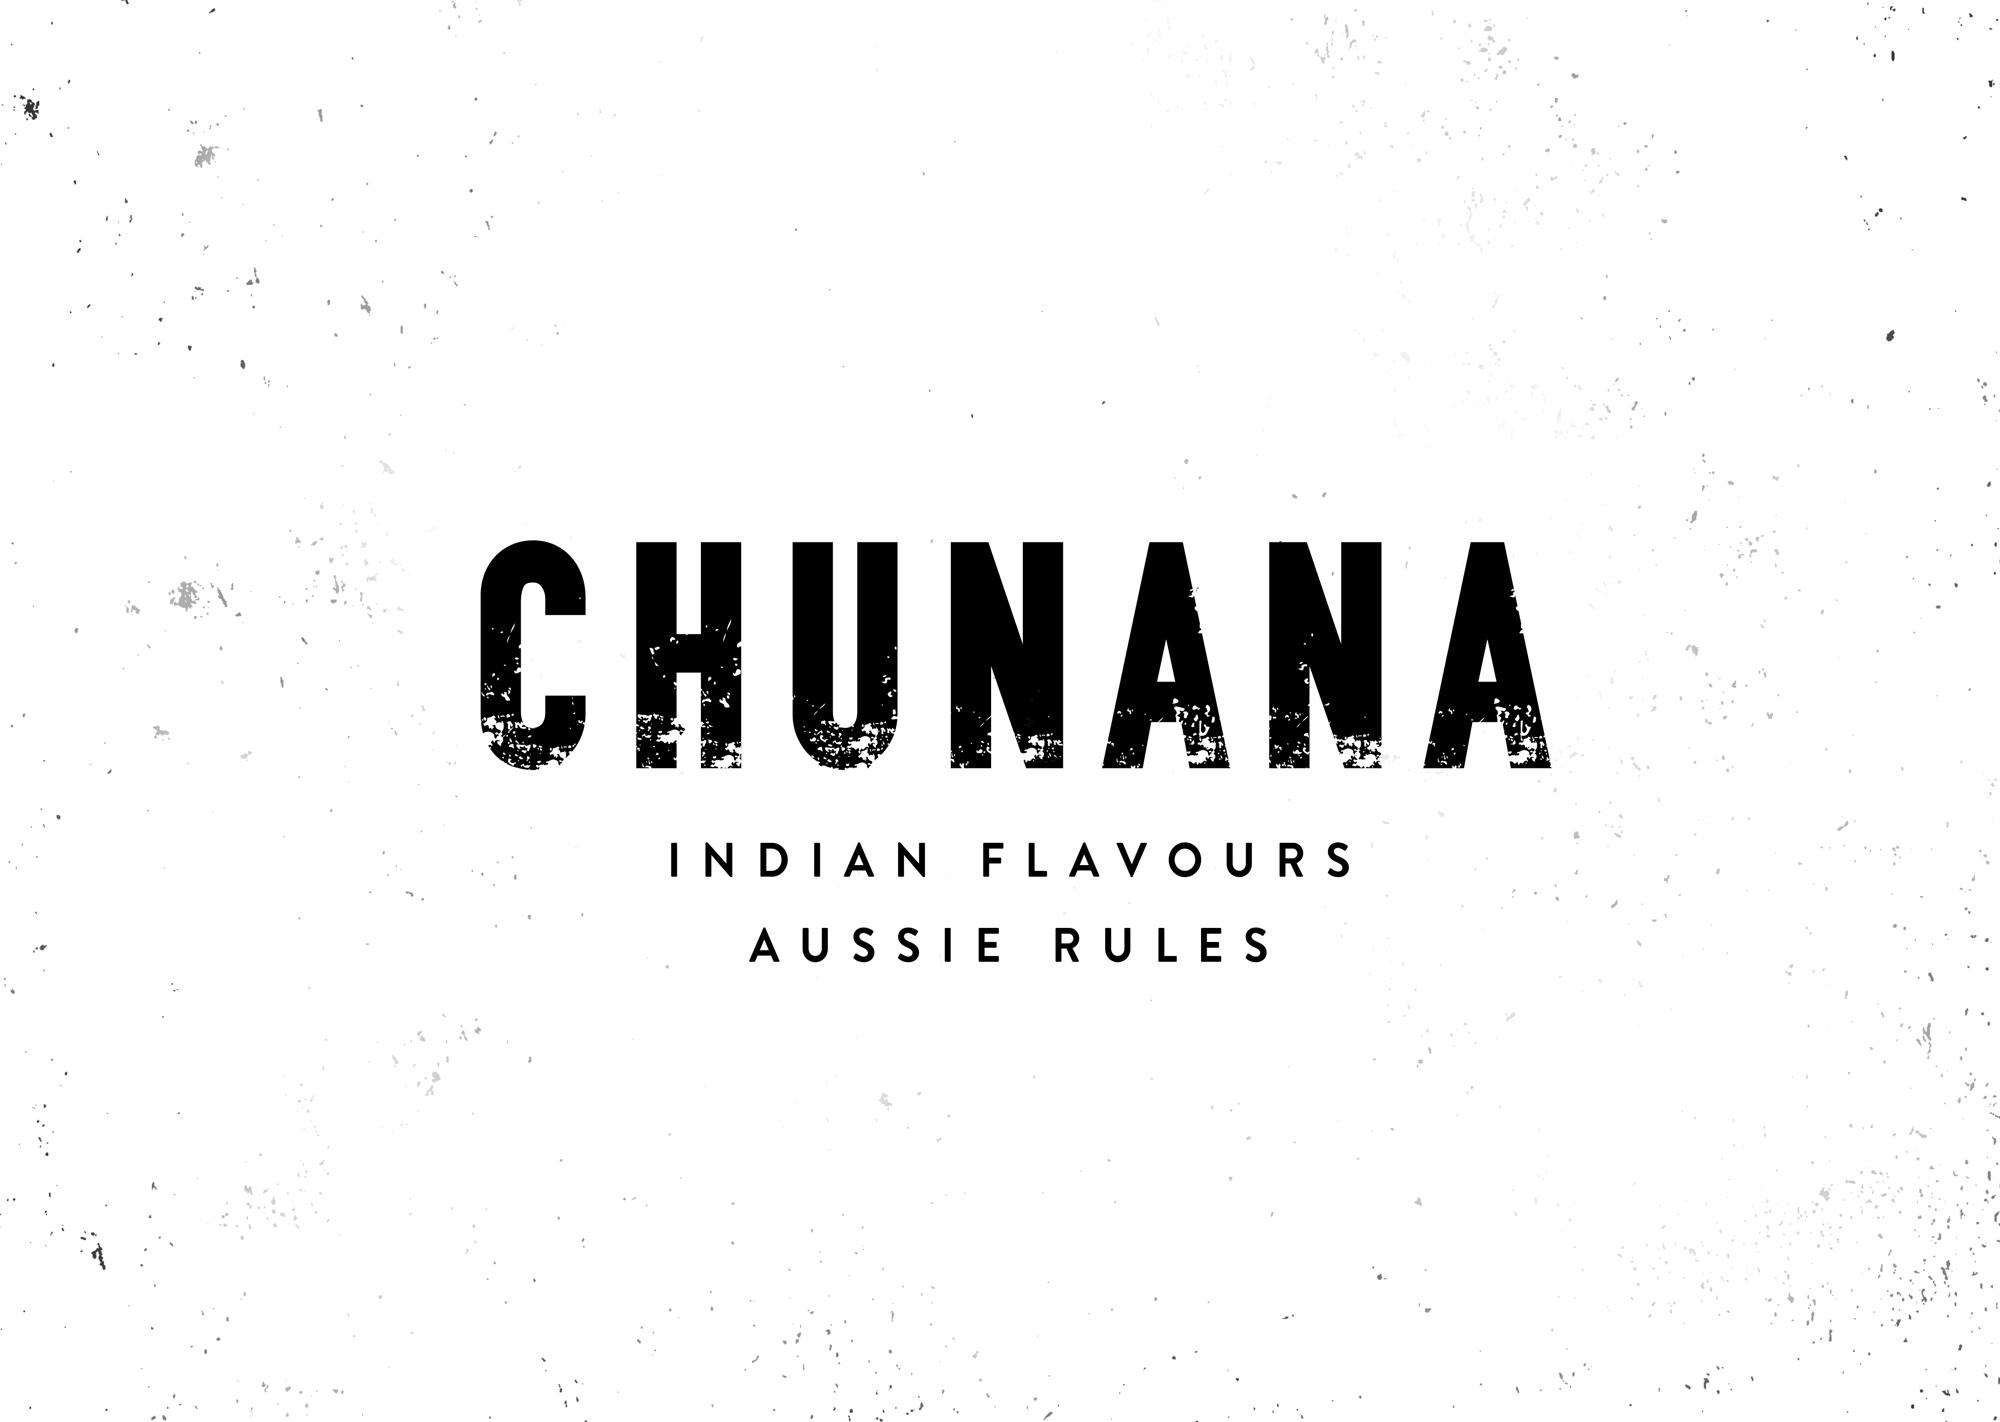 Chunana-black-grungeBG Copy.png